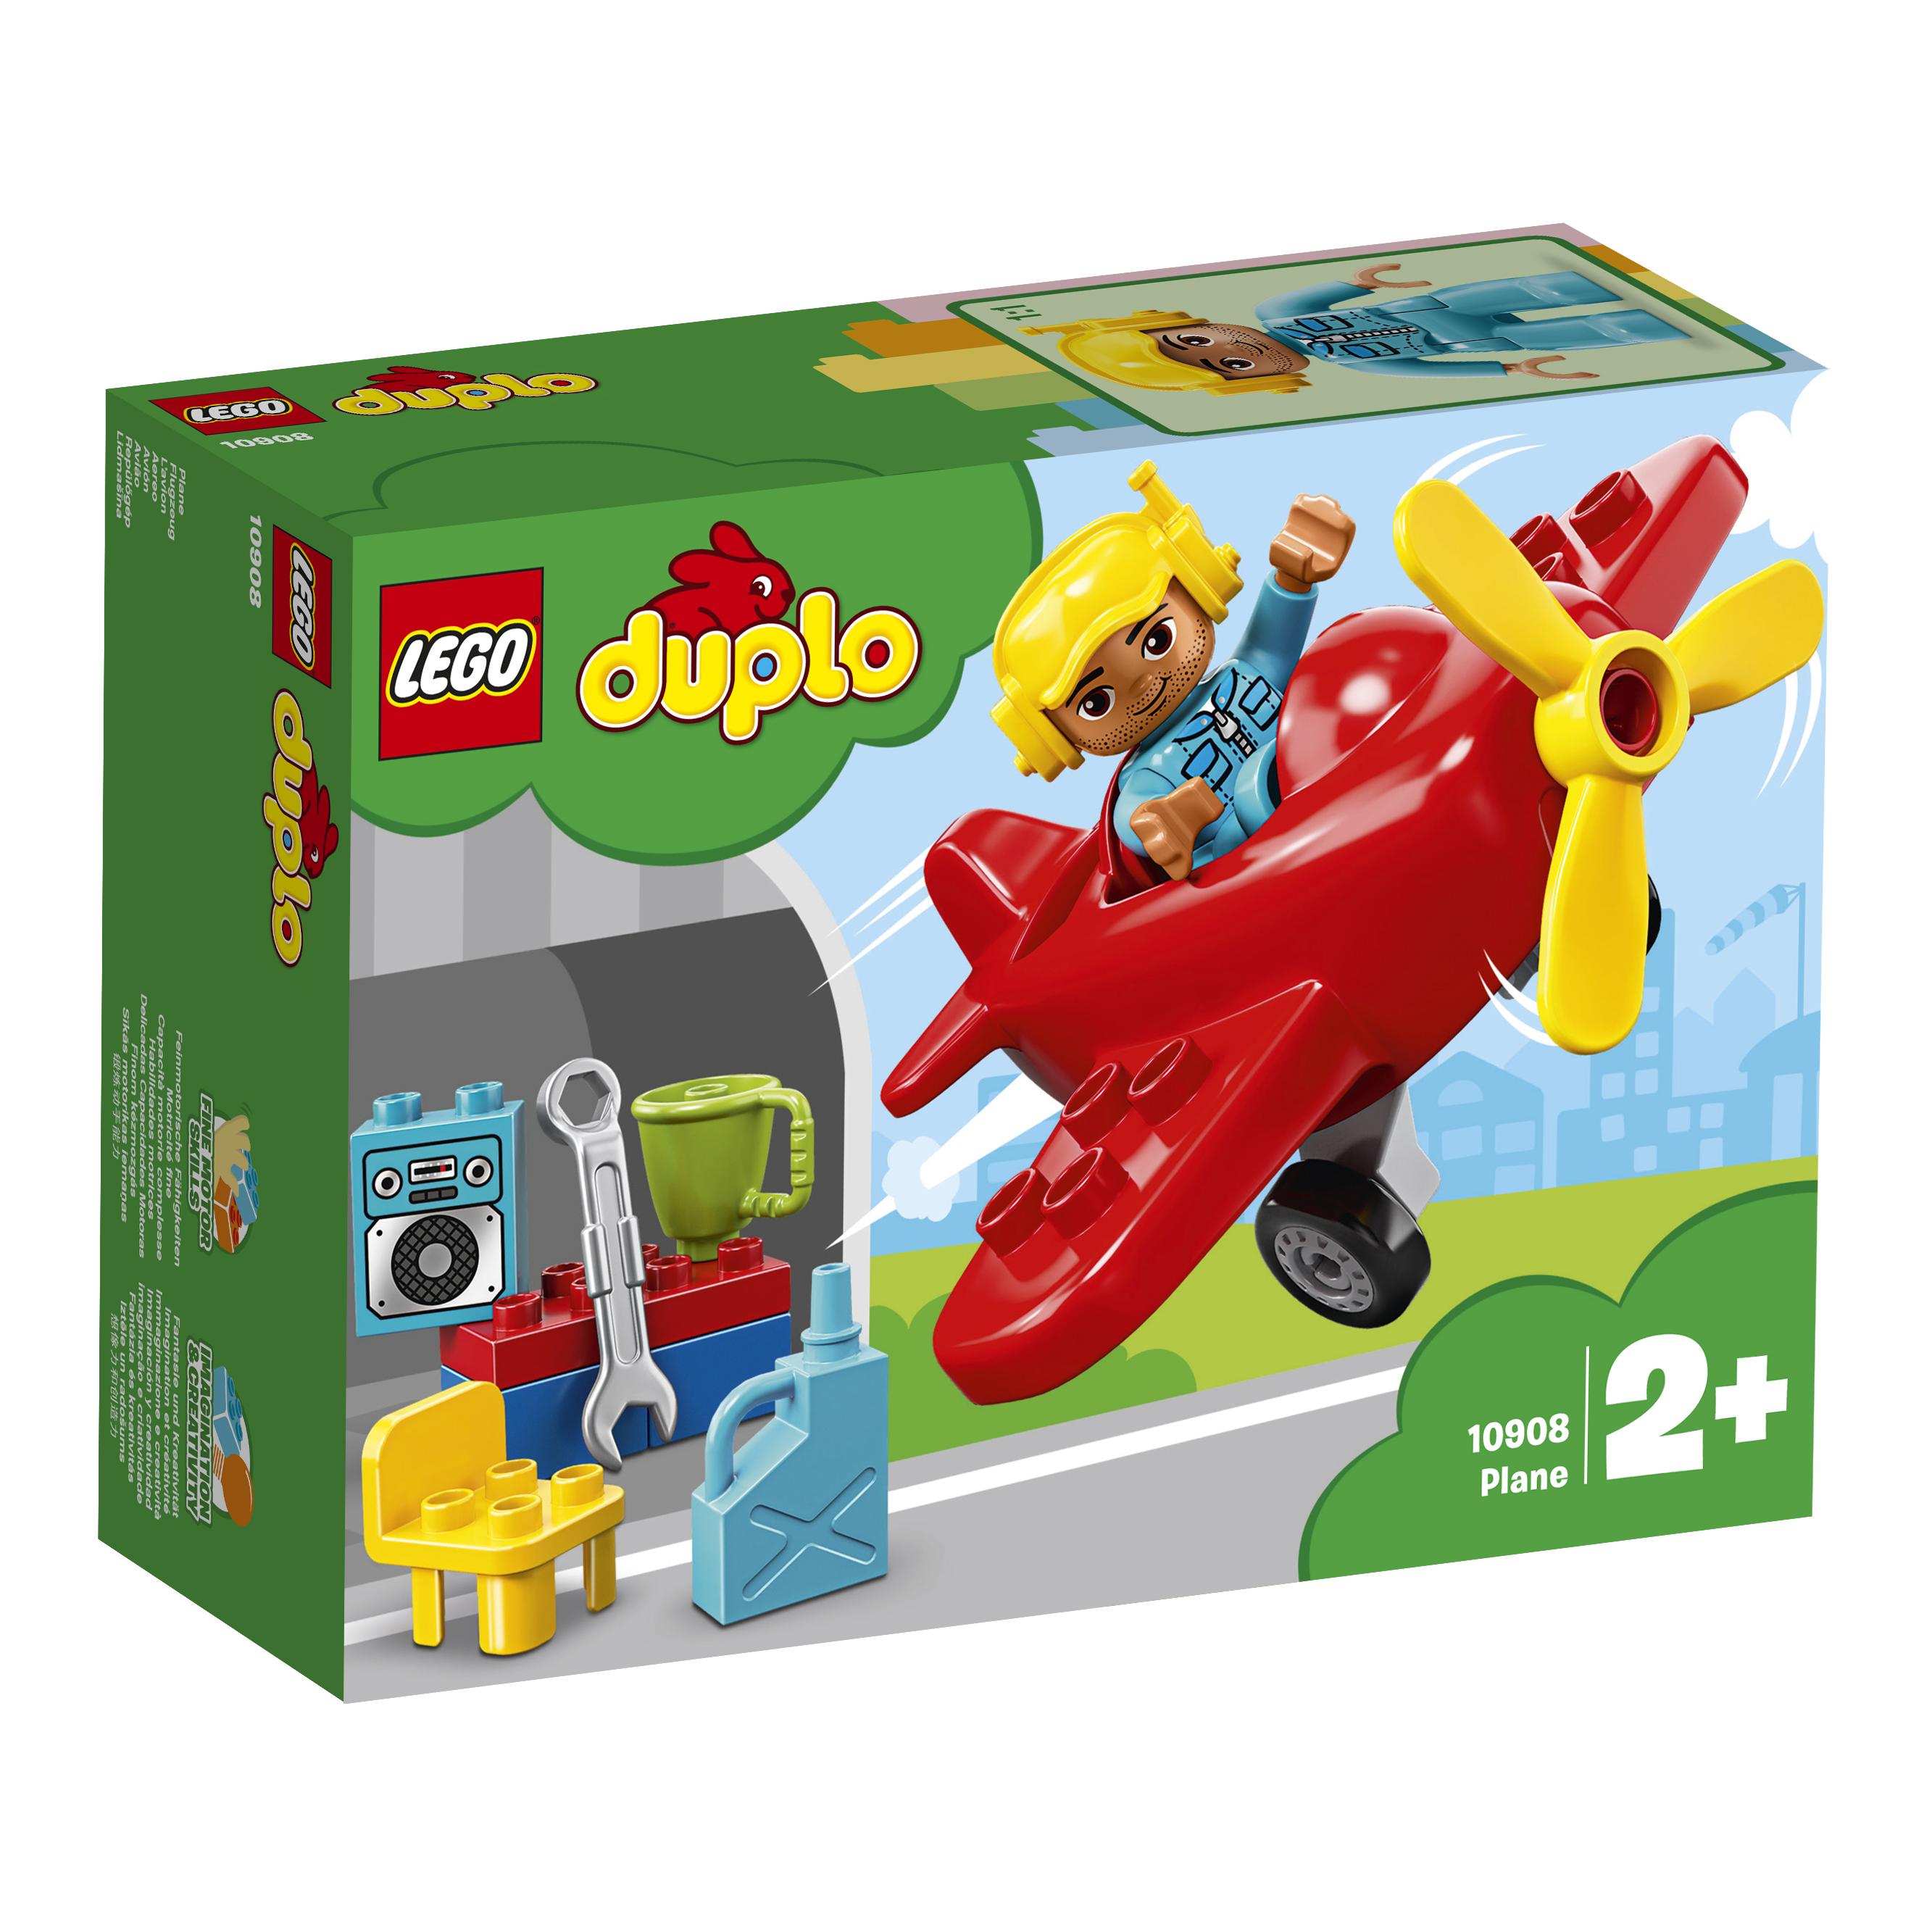 LEGO DUPLO LEGO Town 10908 Самолёт lego duplo конструктор гоночный автомобиль 10589